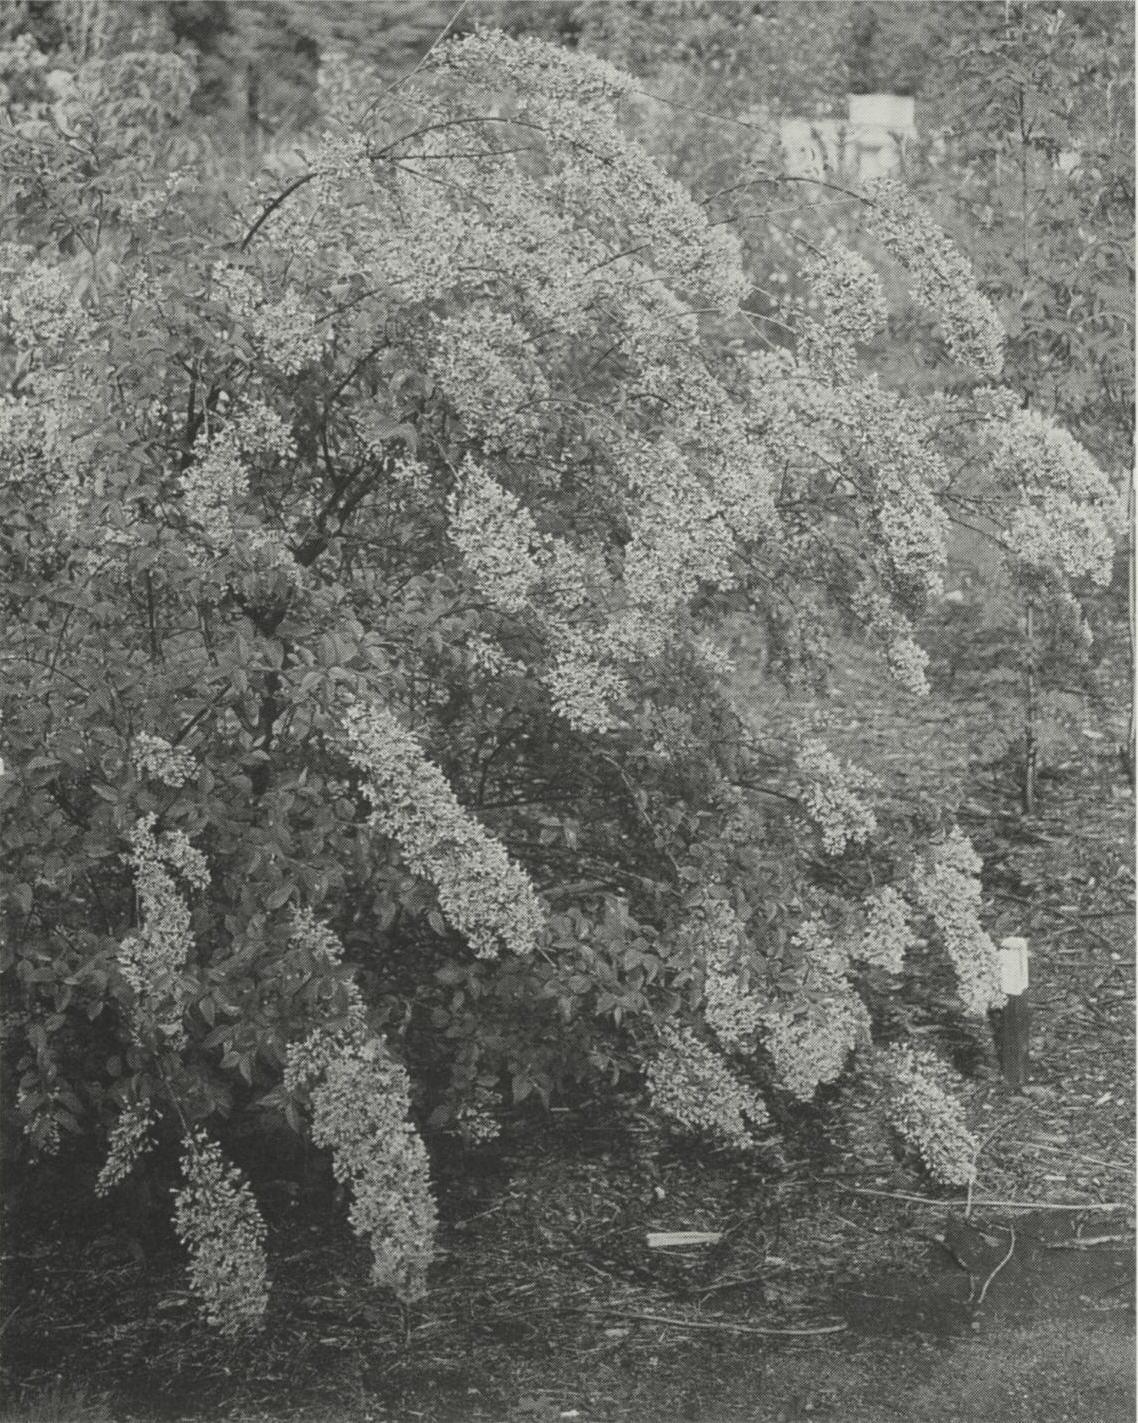 Black-and-white photograph of lilac shrub